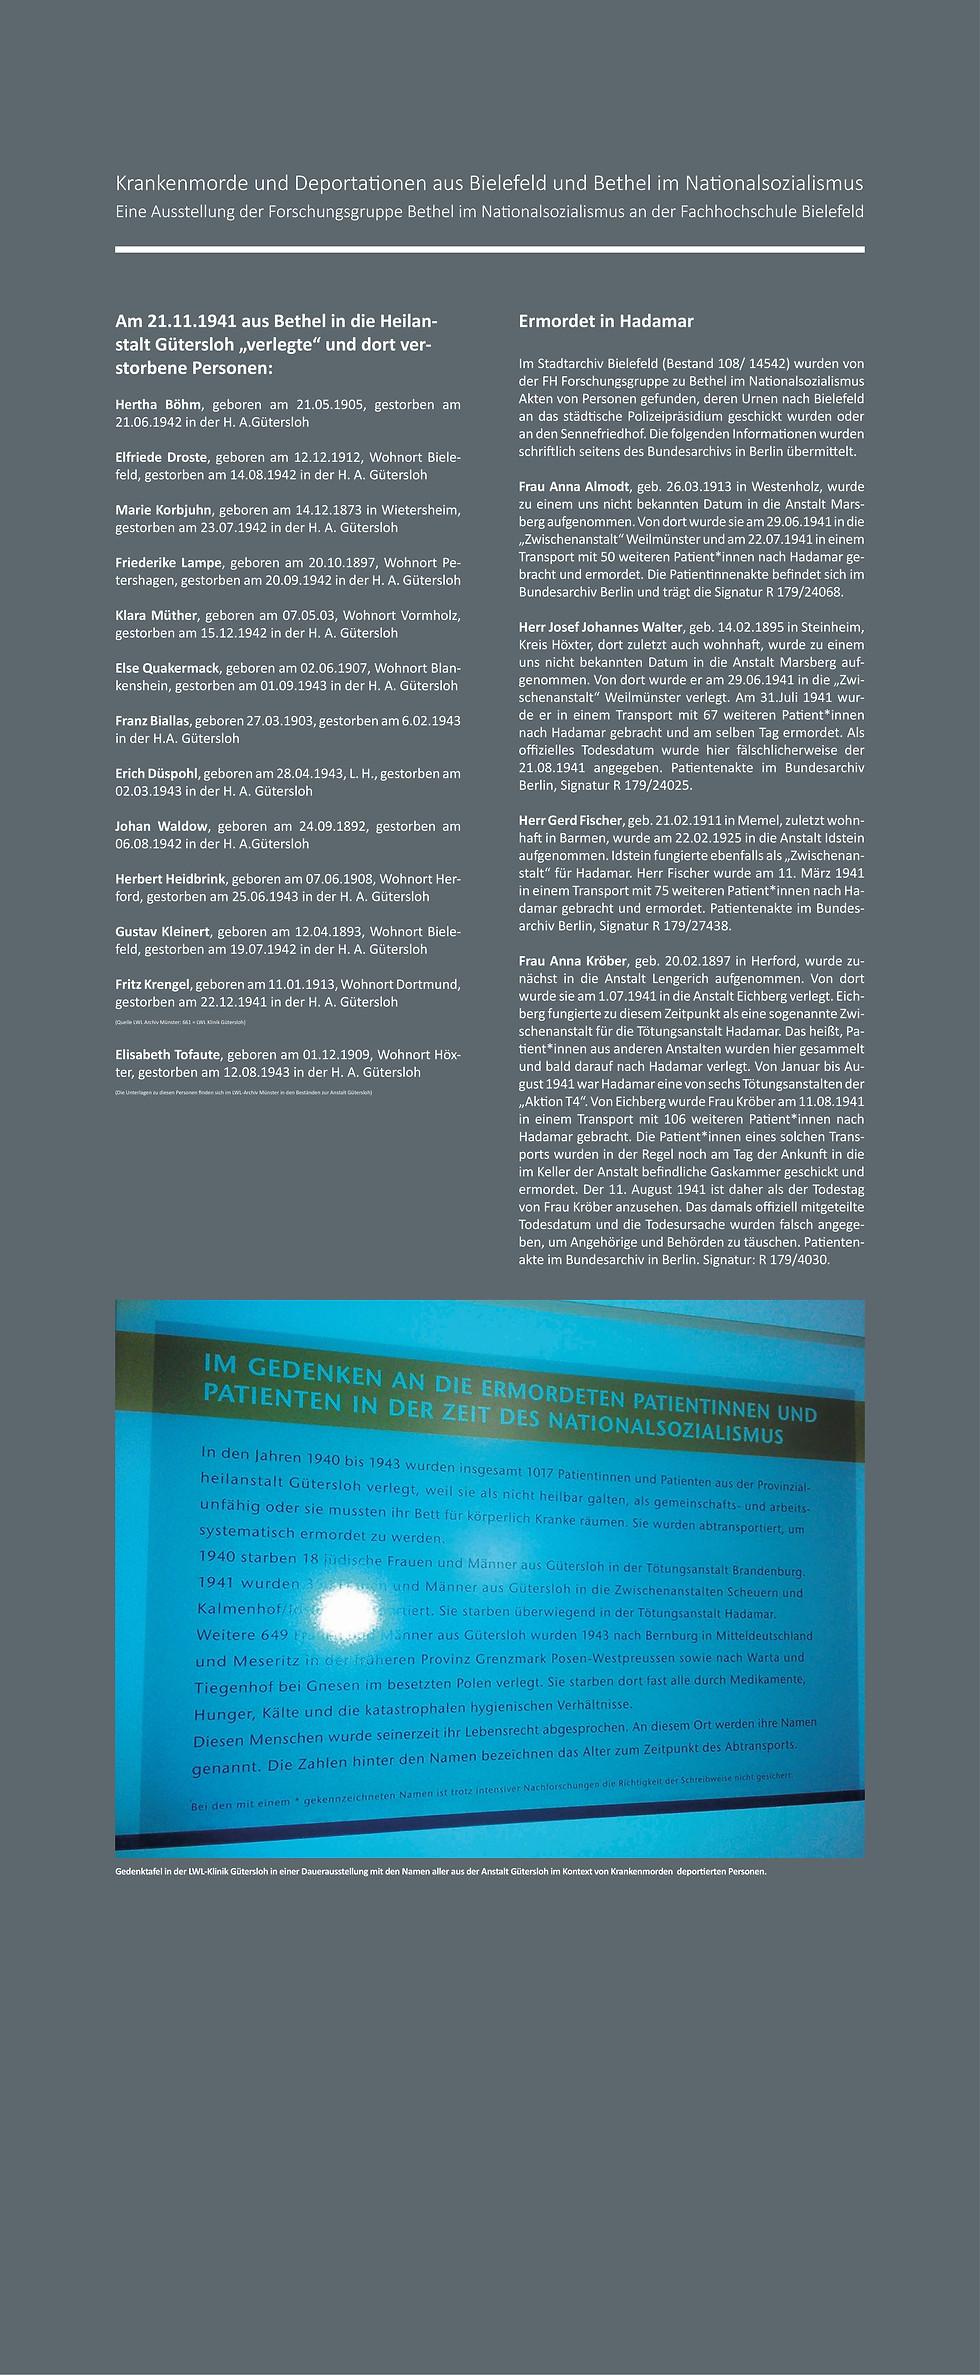 Krankenmorde und Deportationen-002.jpg